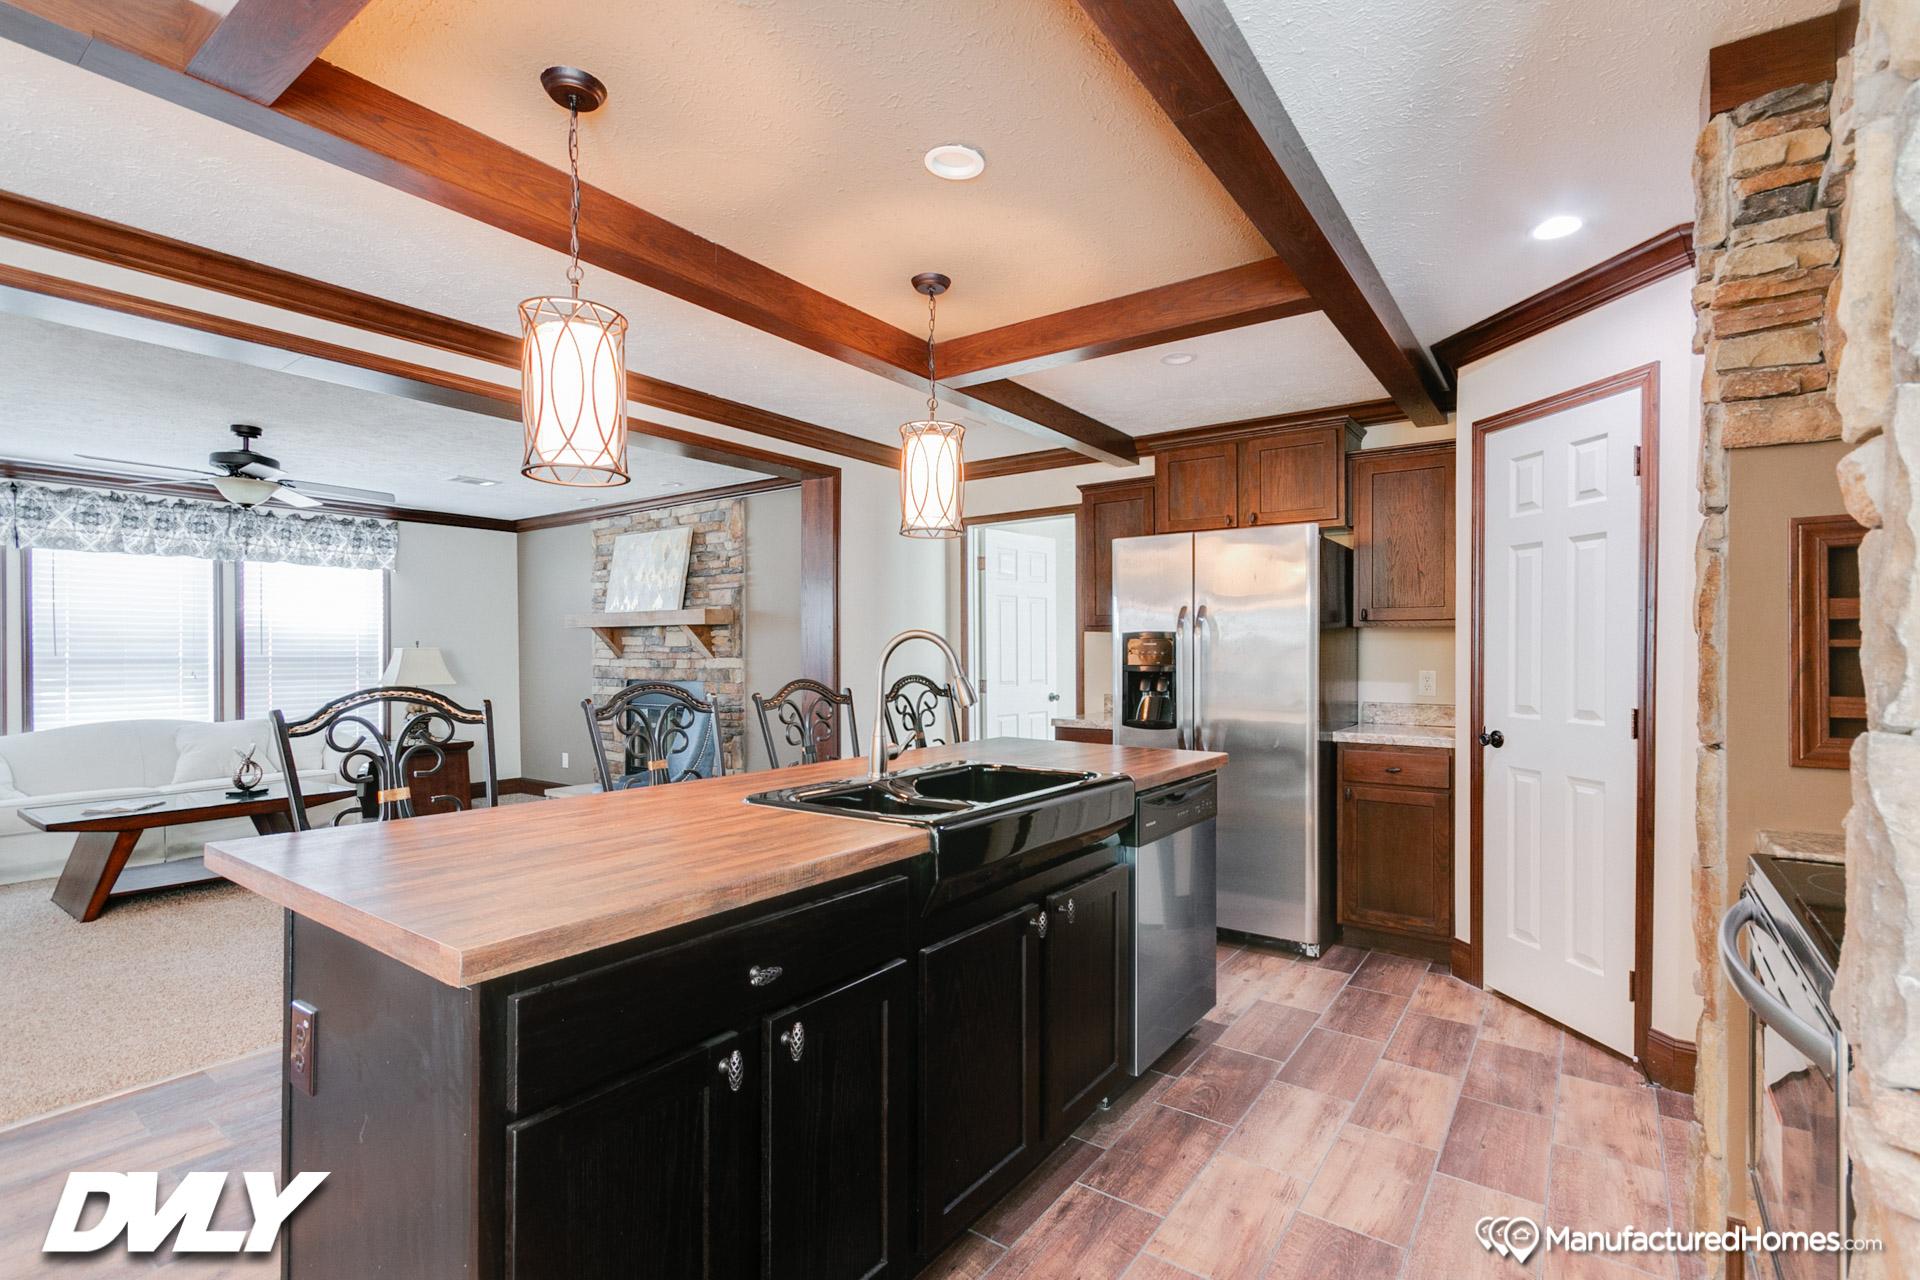 Woodland Series / Maison Calme WL-6806B - Kitchen